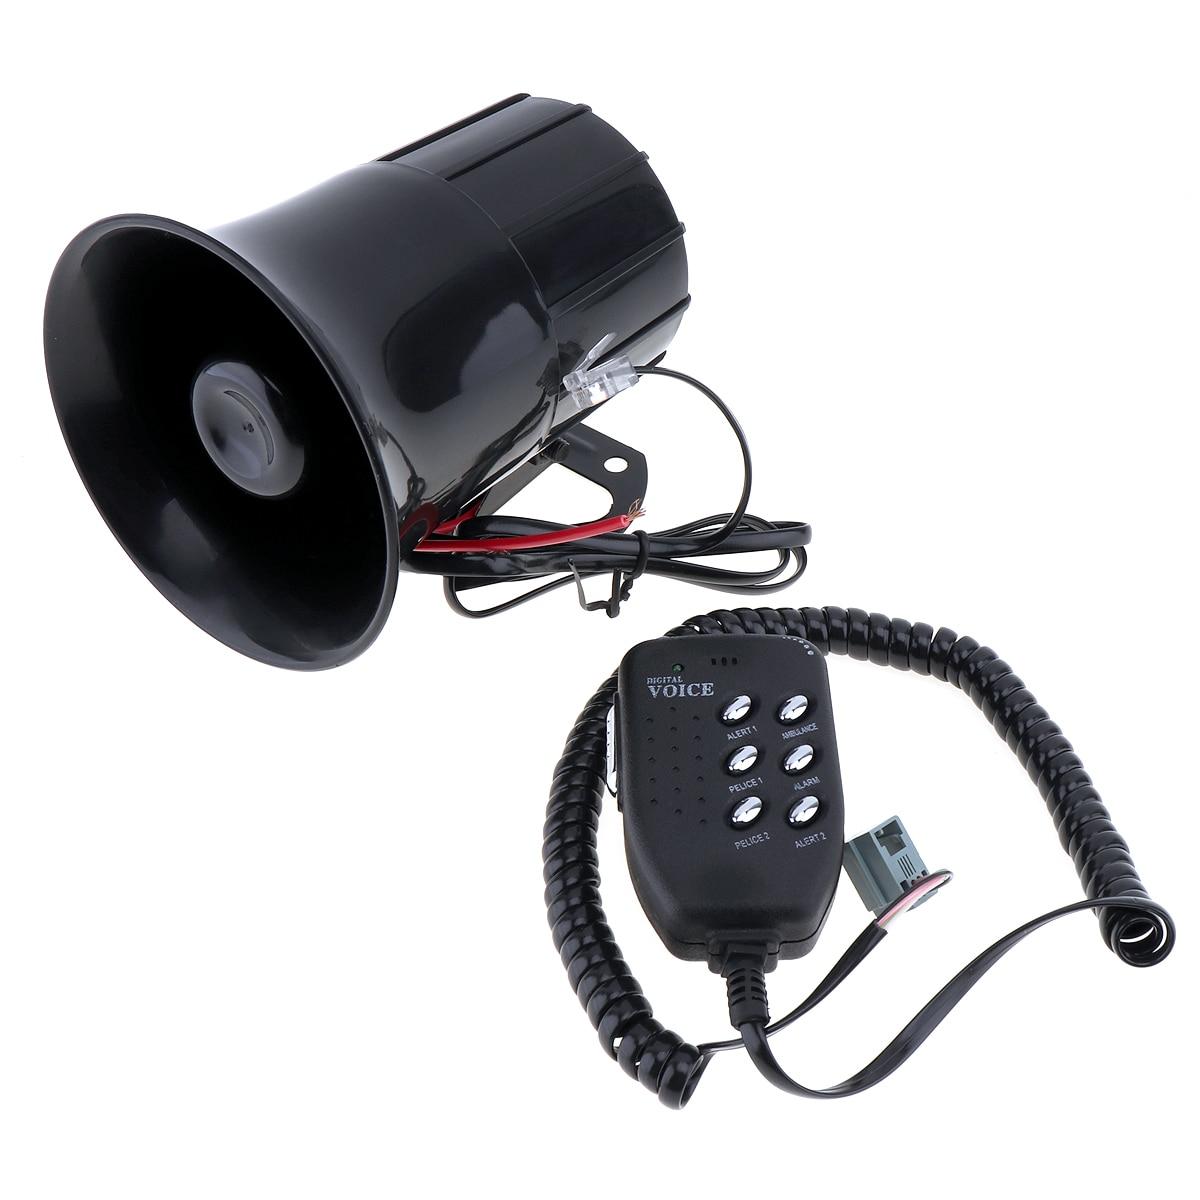 Car Styling & Body Fittings Loud Horn 12V Car Siren Auto Van